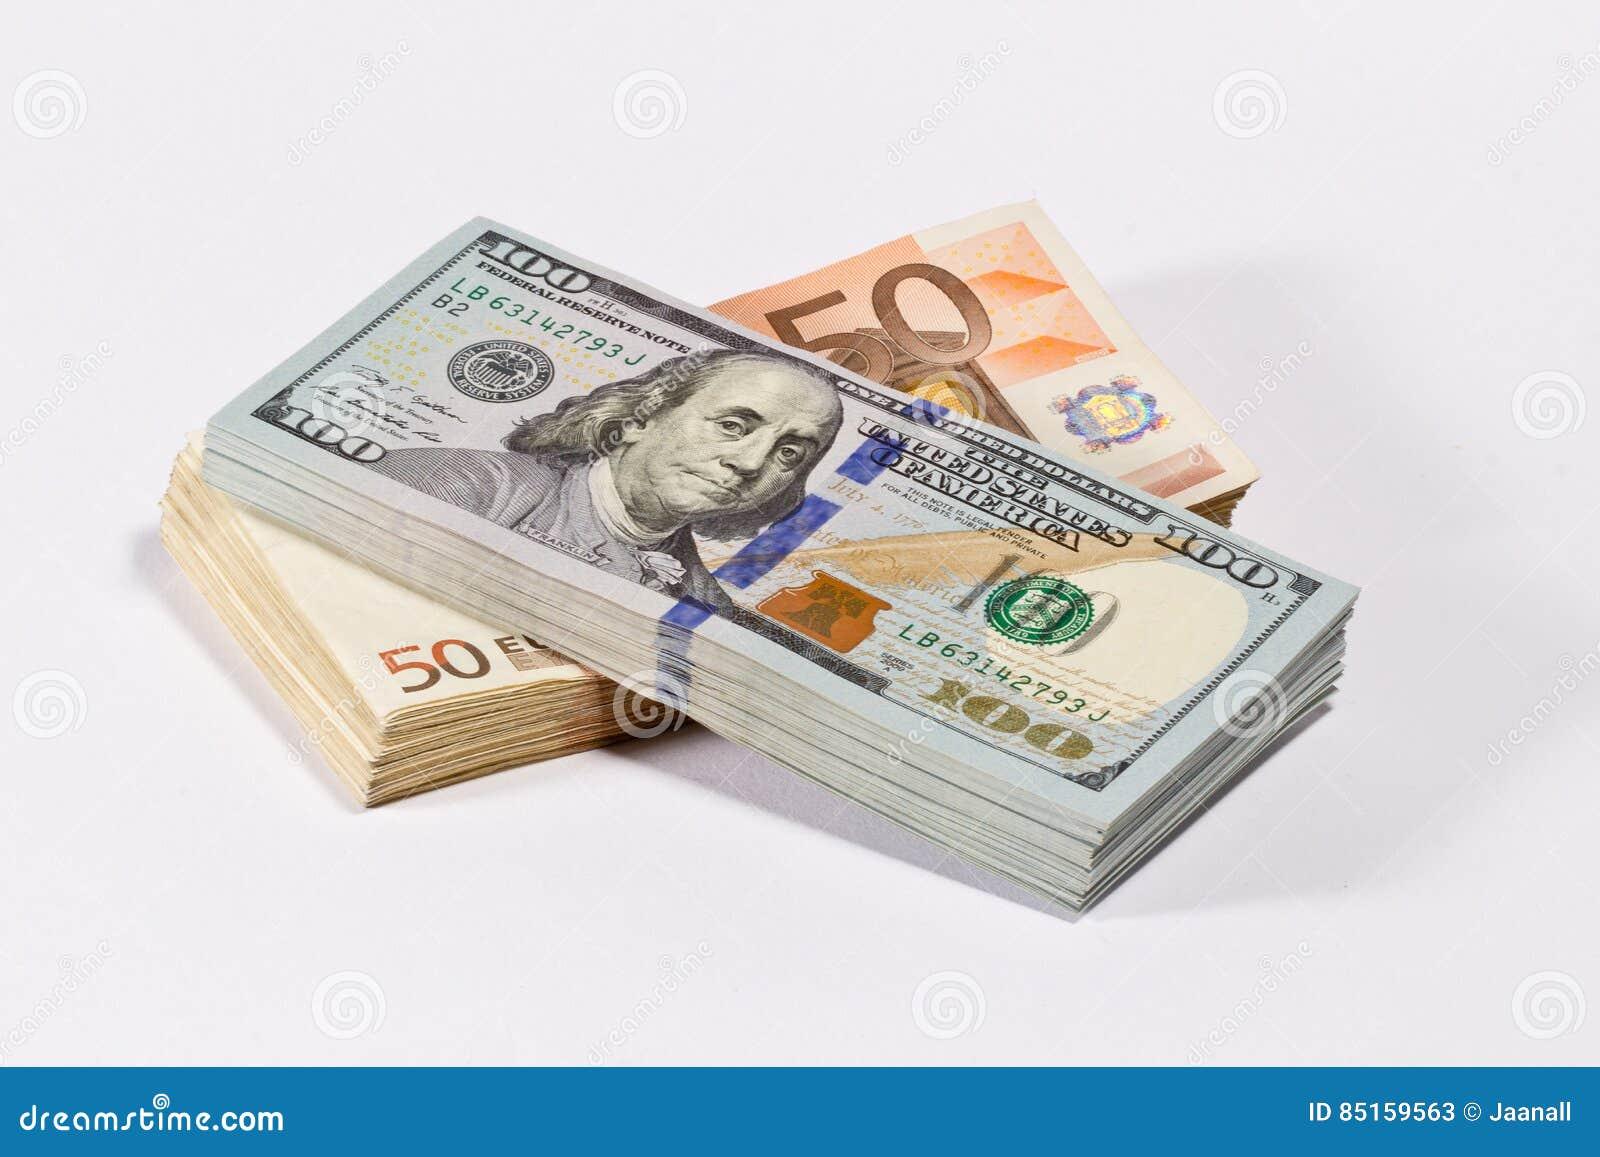 Dollars And Euros